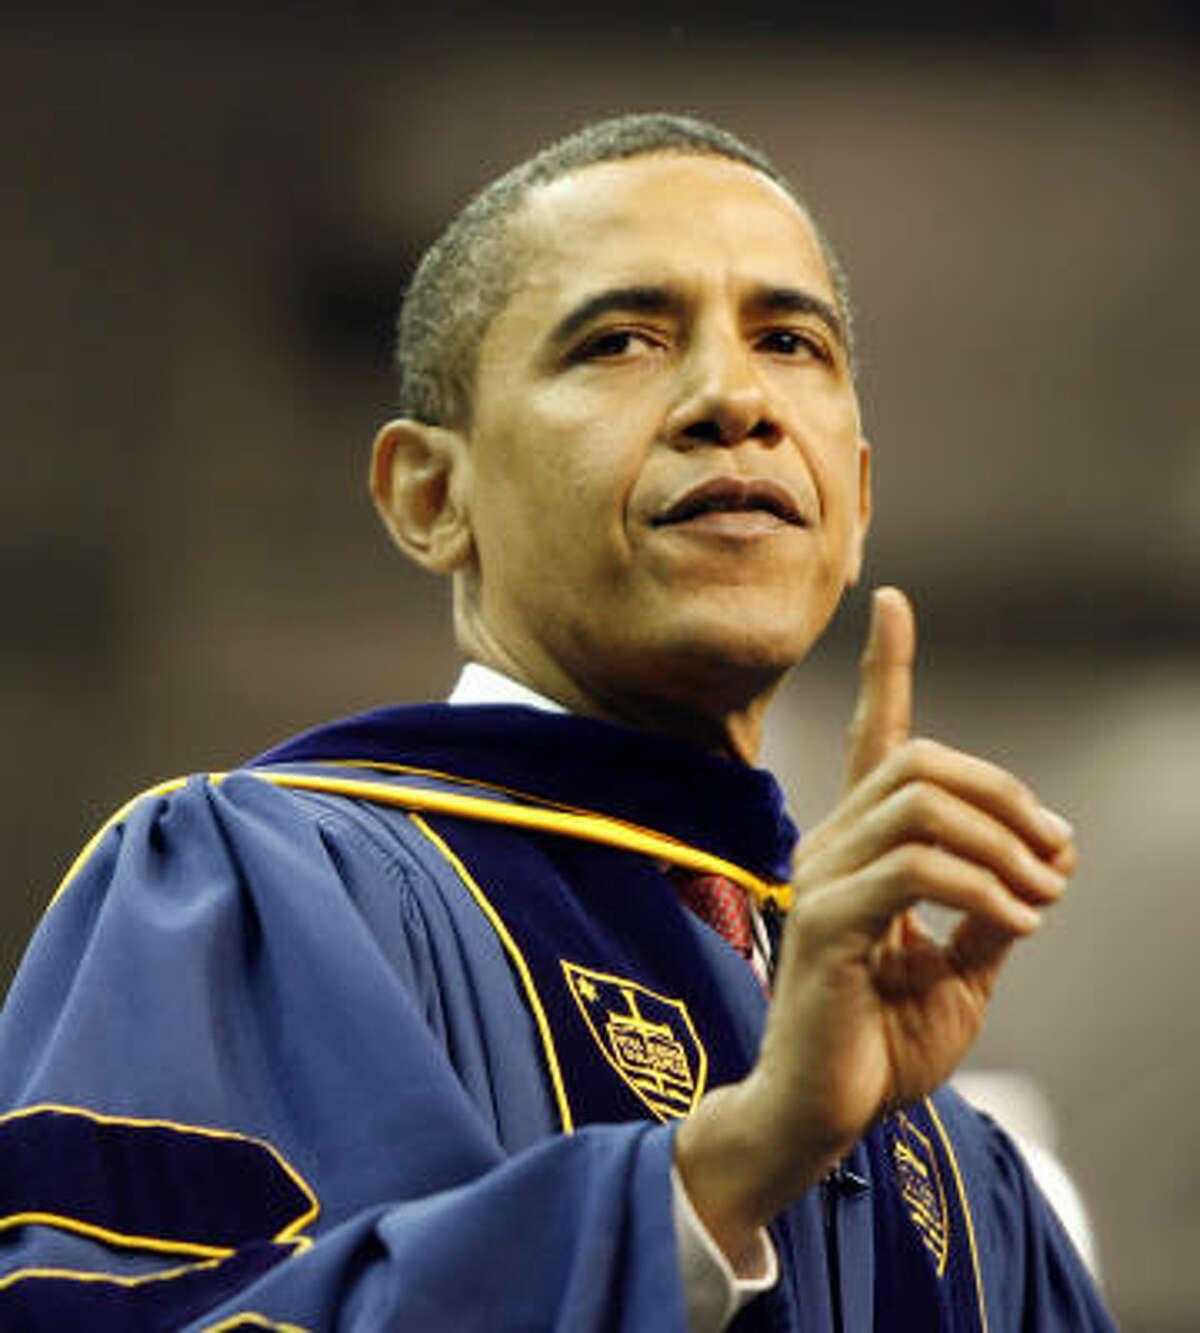 President Barack Obama addresses the Notre Dame University graduating class of 2009.